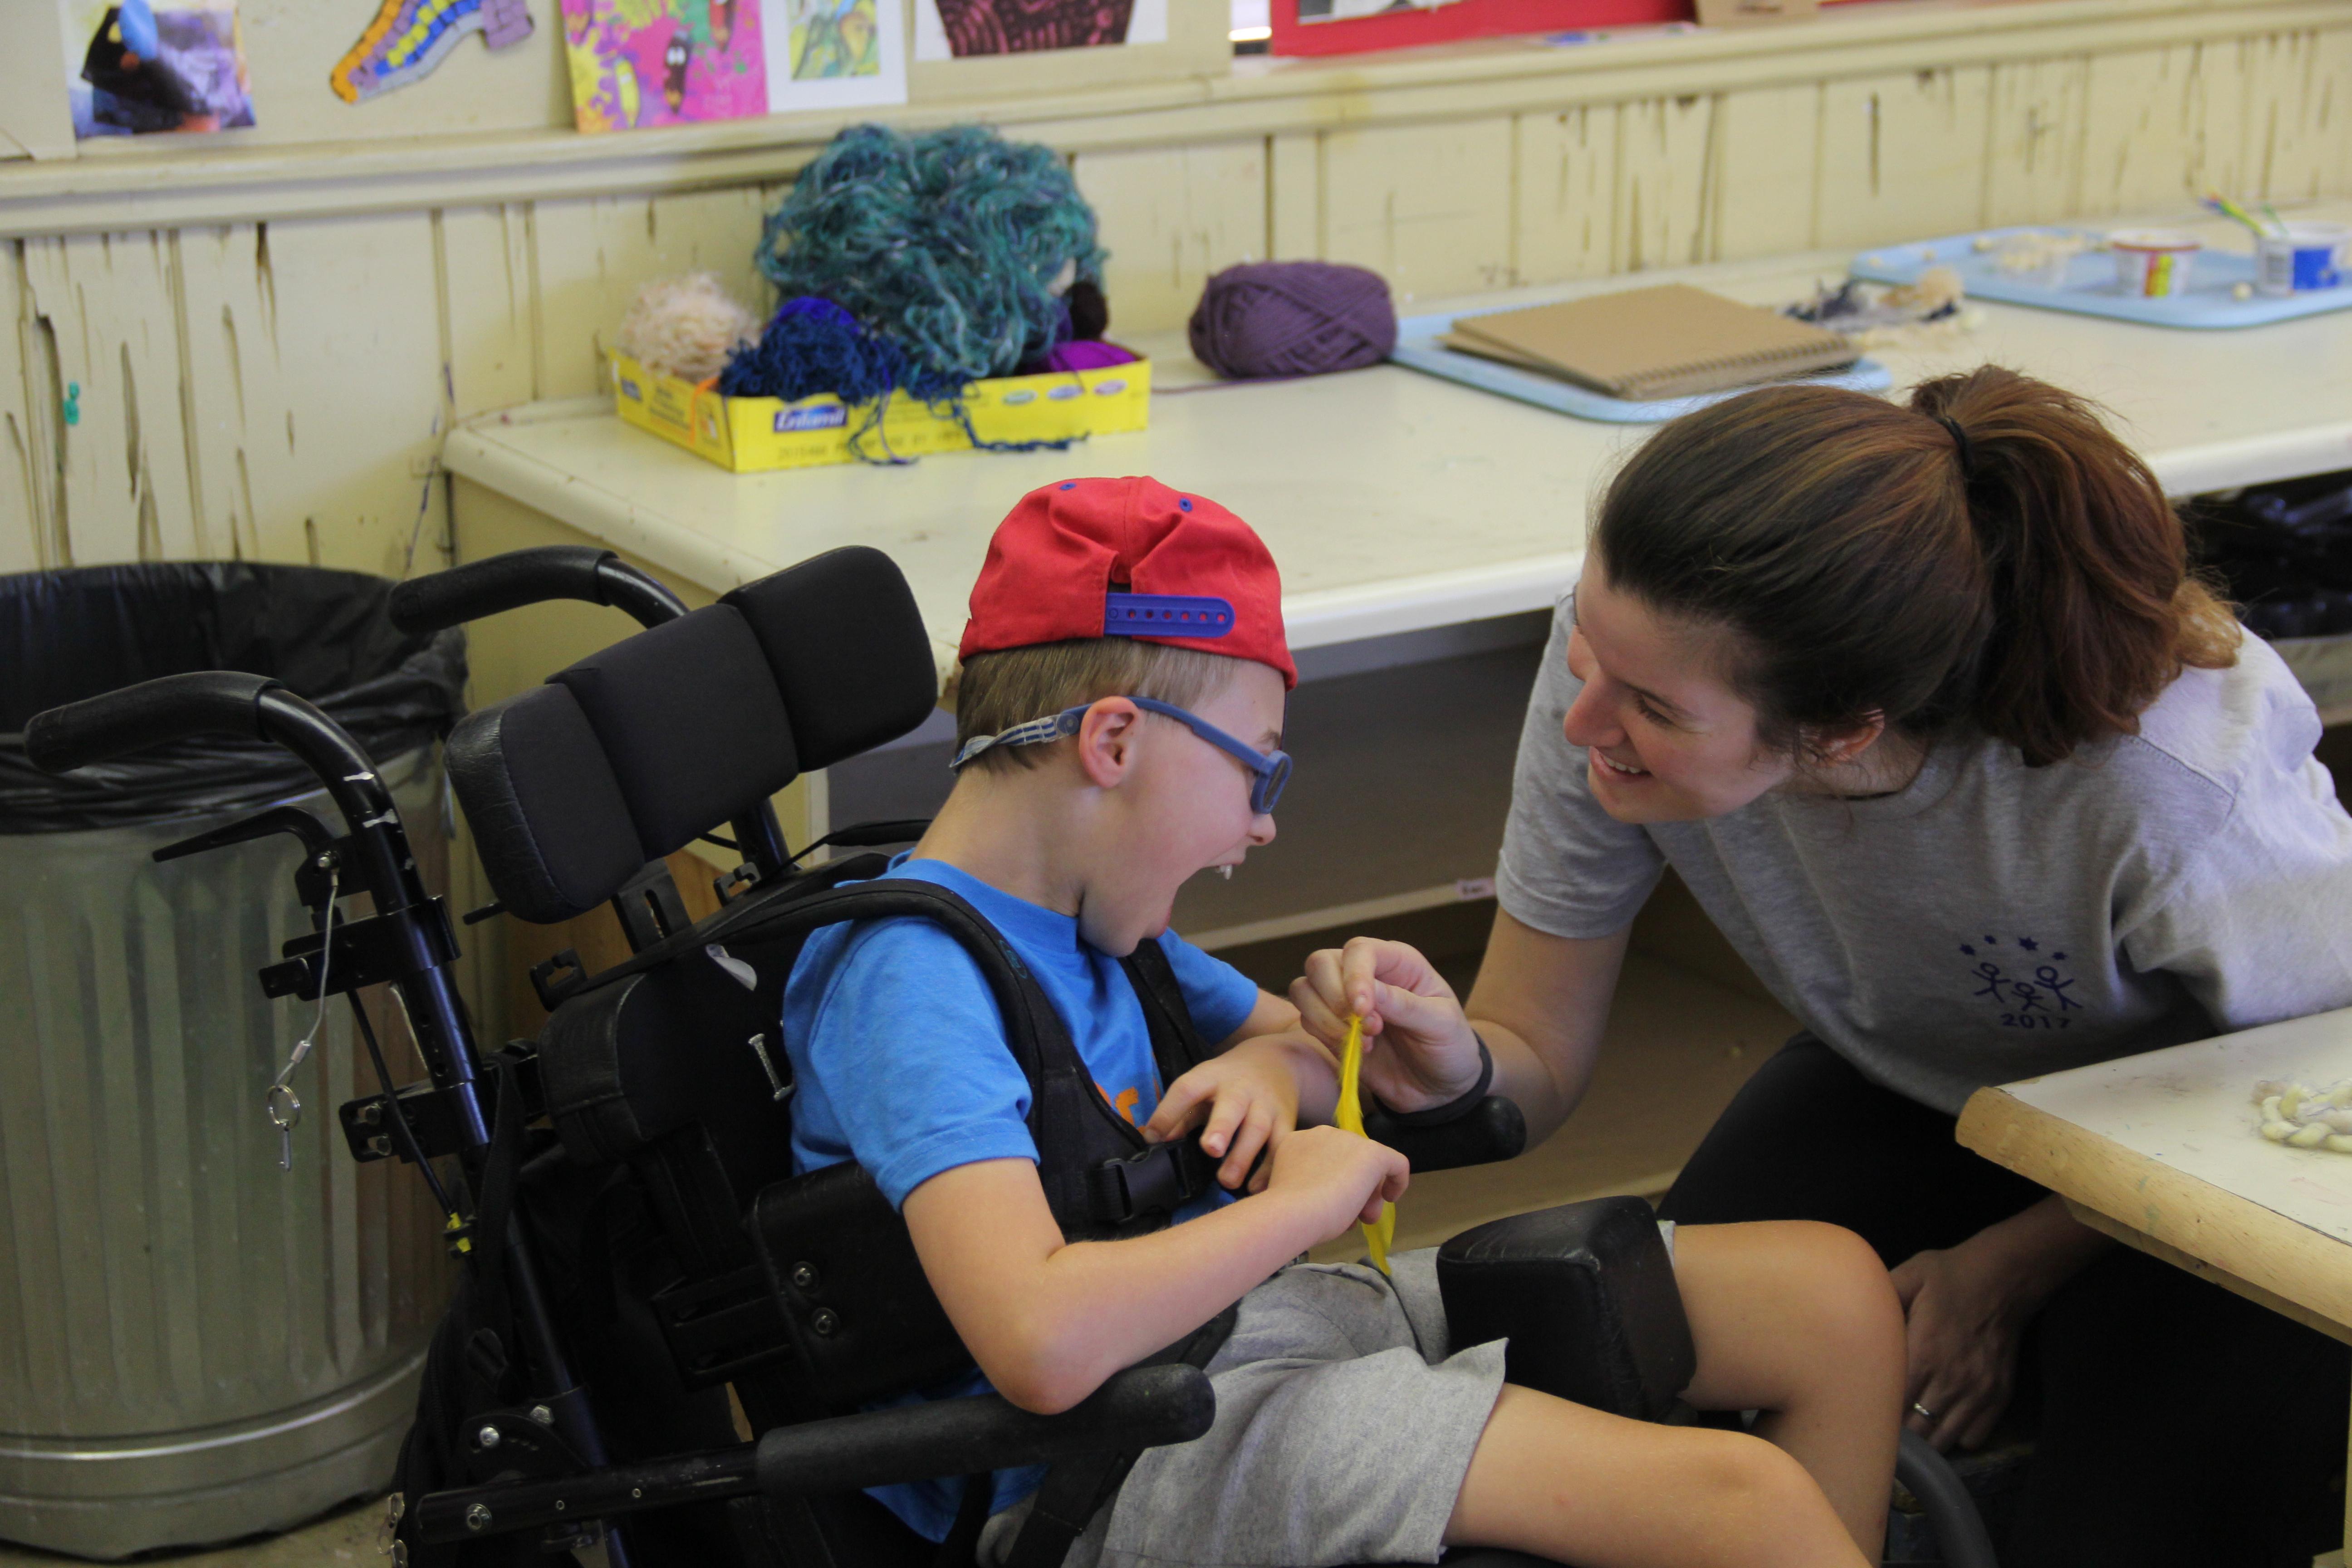 Ramah Tikvah Programs: A Standard for Jewish Inclusive Camping